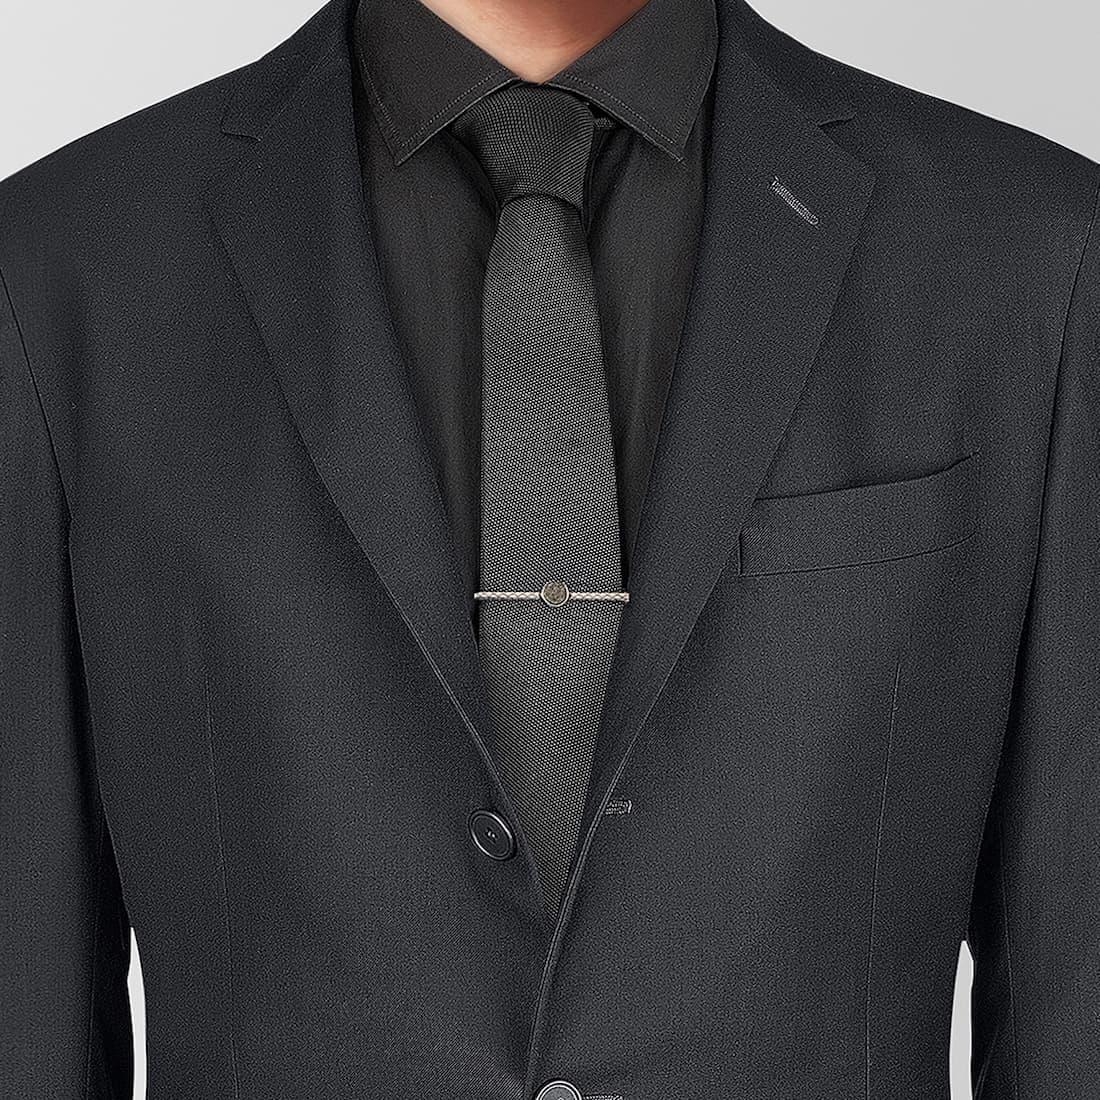 Pair Jewellery with a Suit: Bottega Veneta